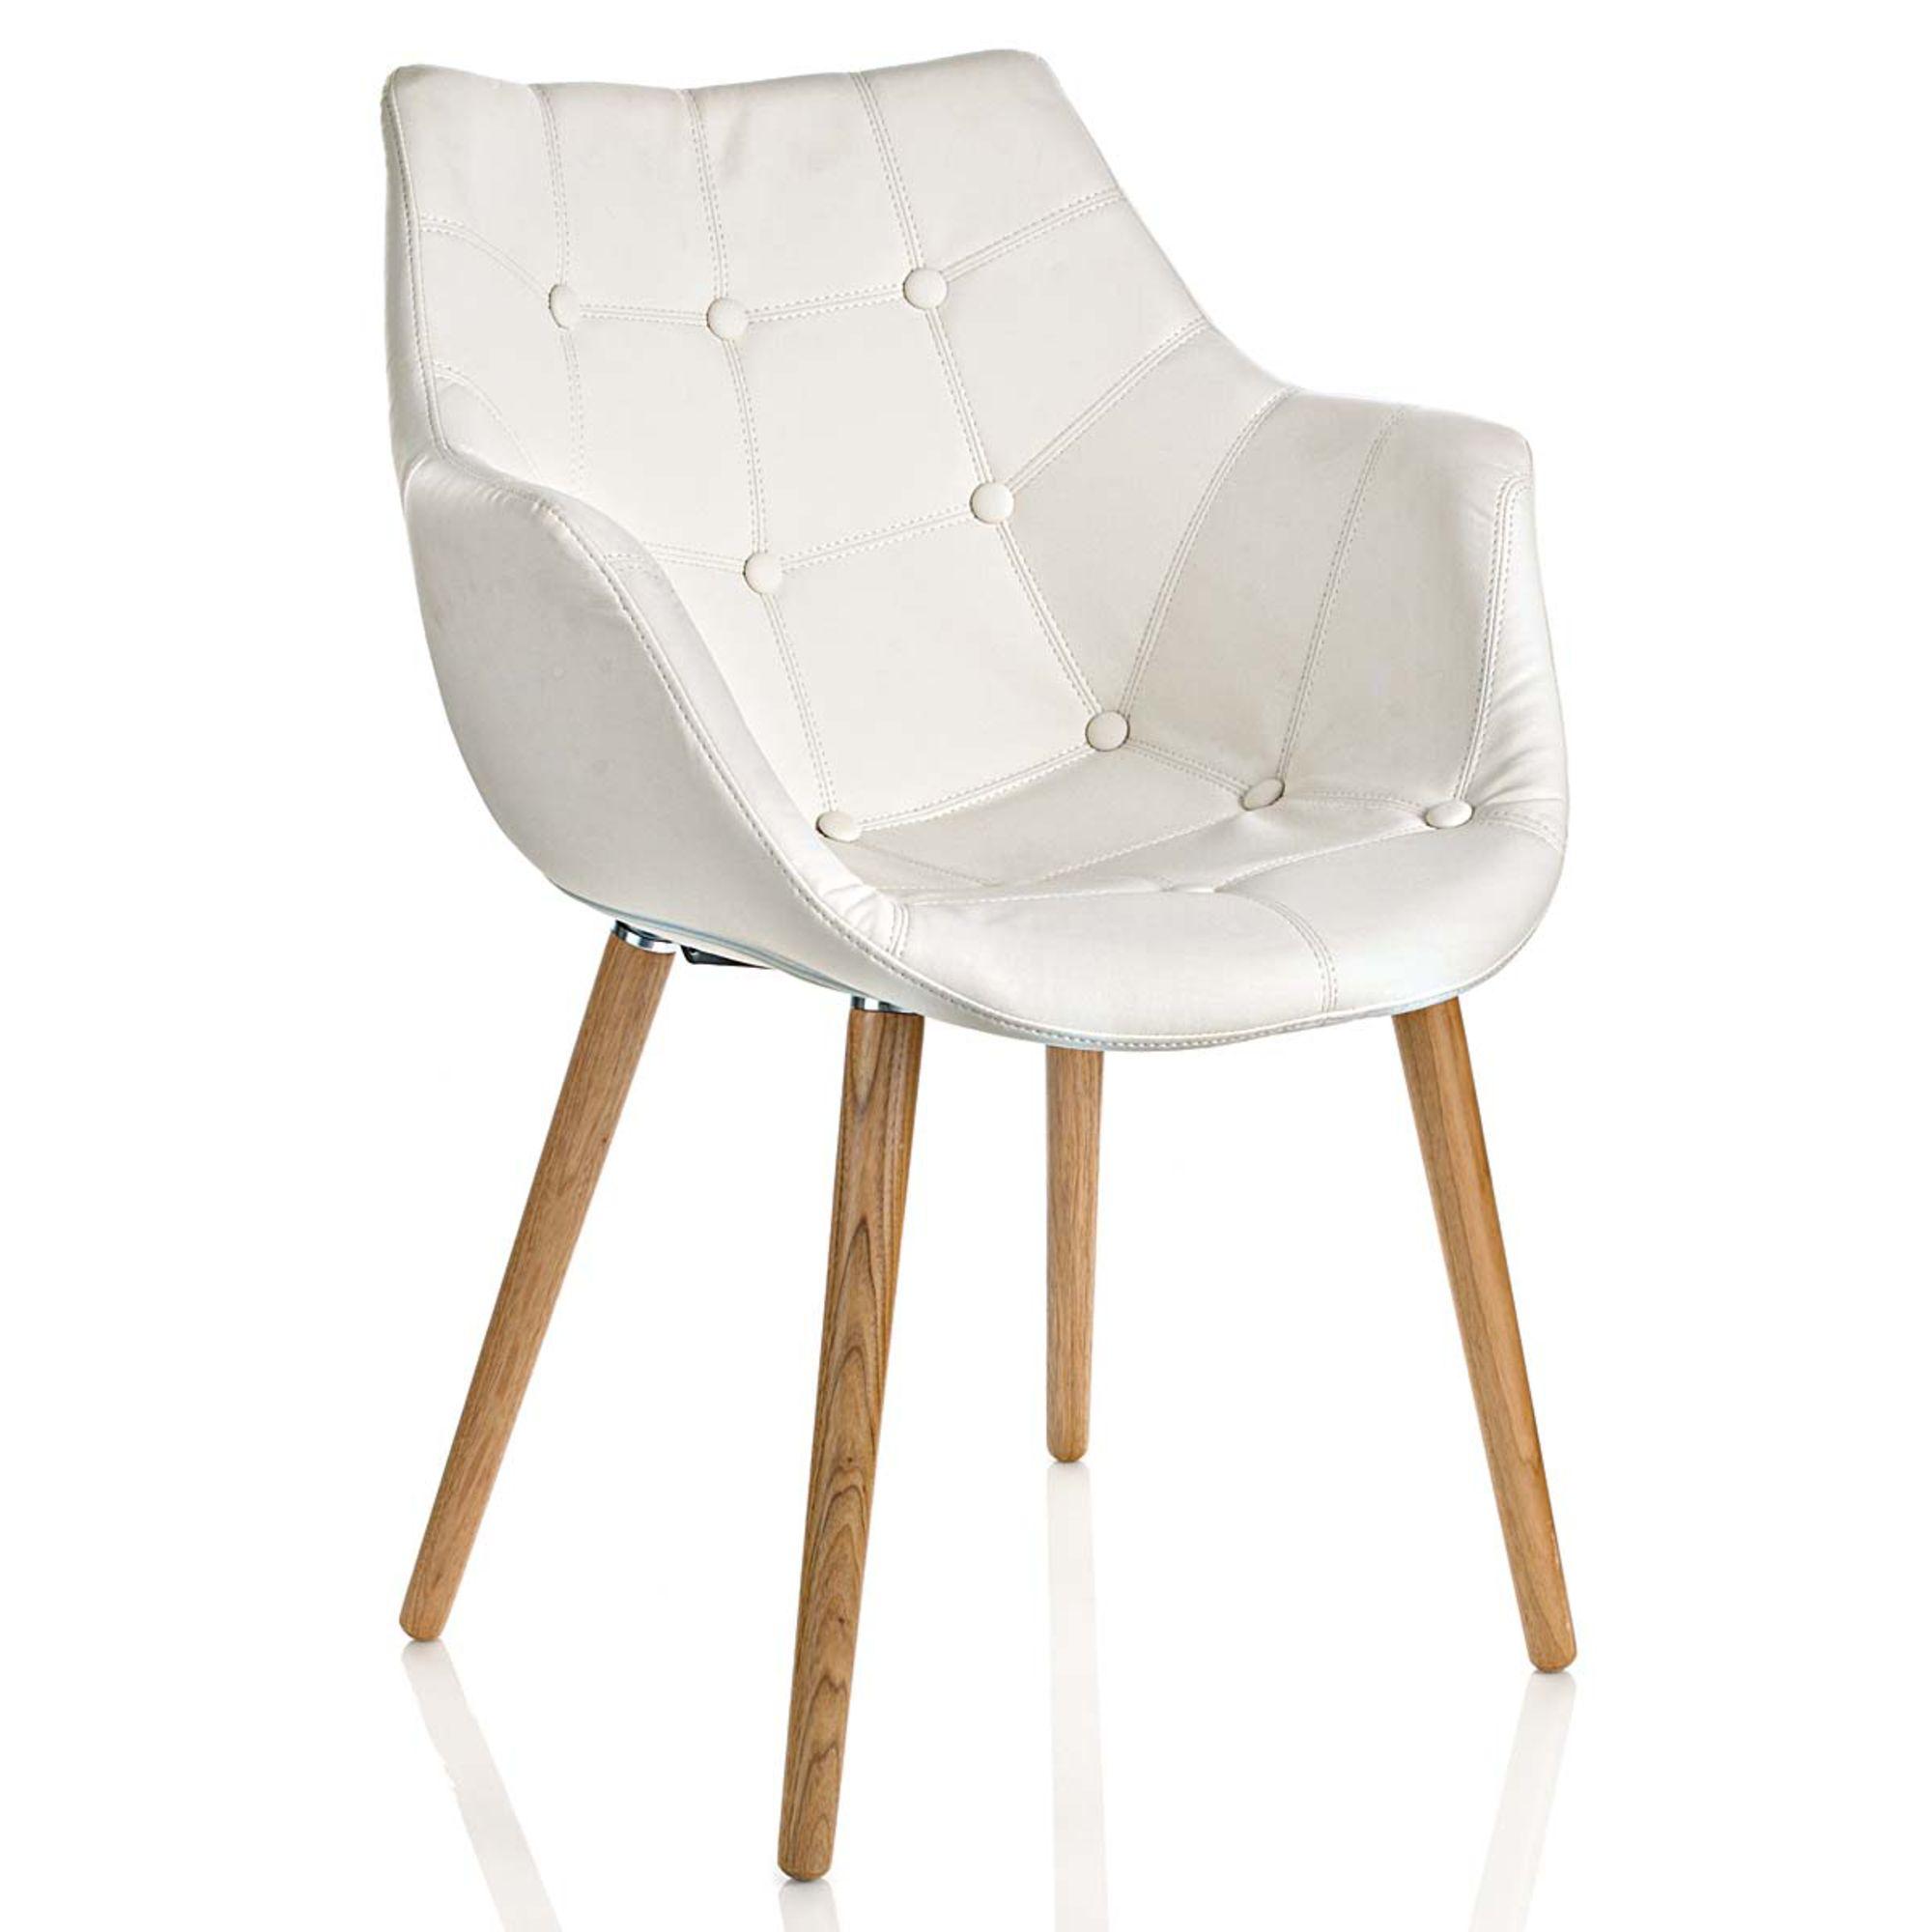 Stuhl In Natur Weiss Bei Impressionen Stuhle Buchenholz Weisse Stuhle